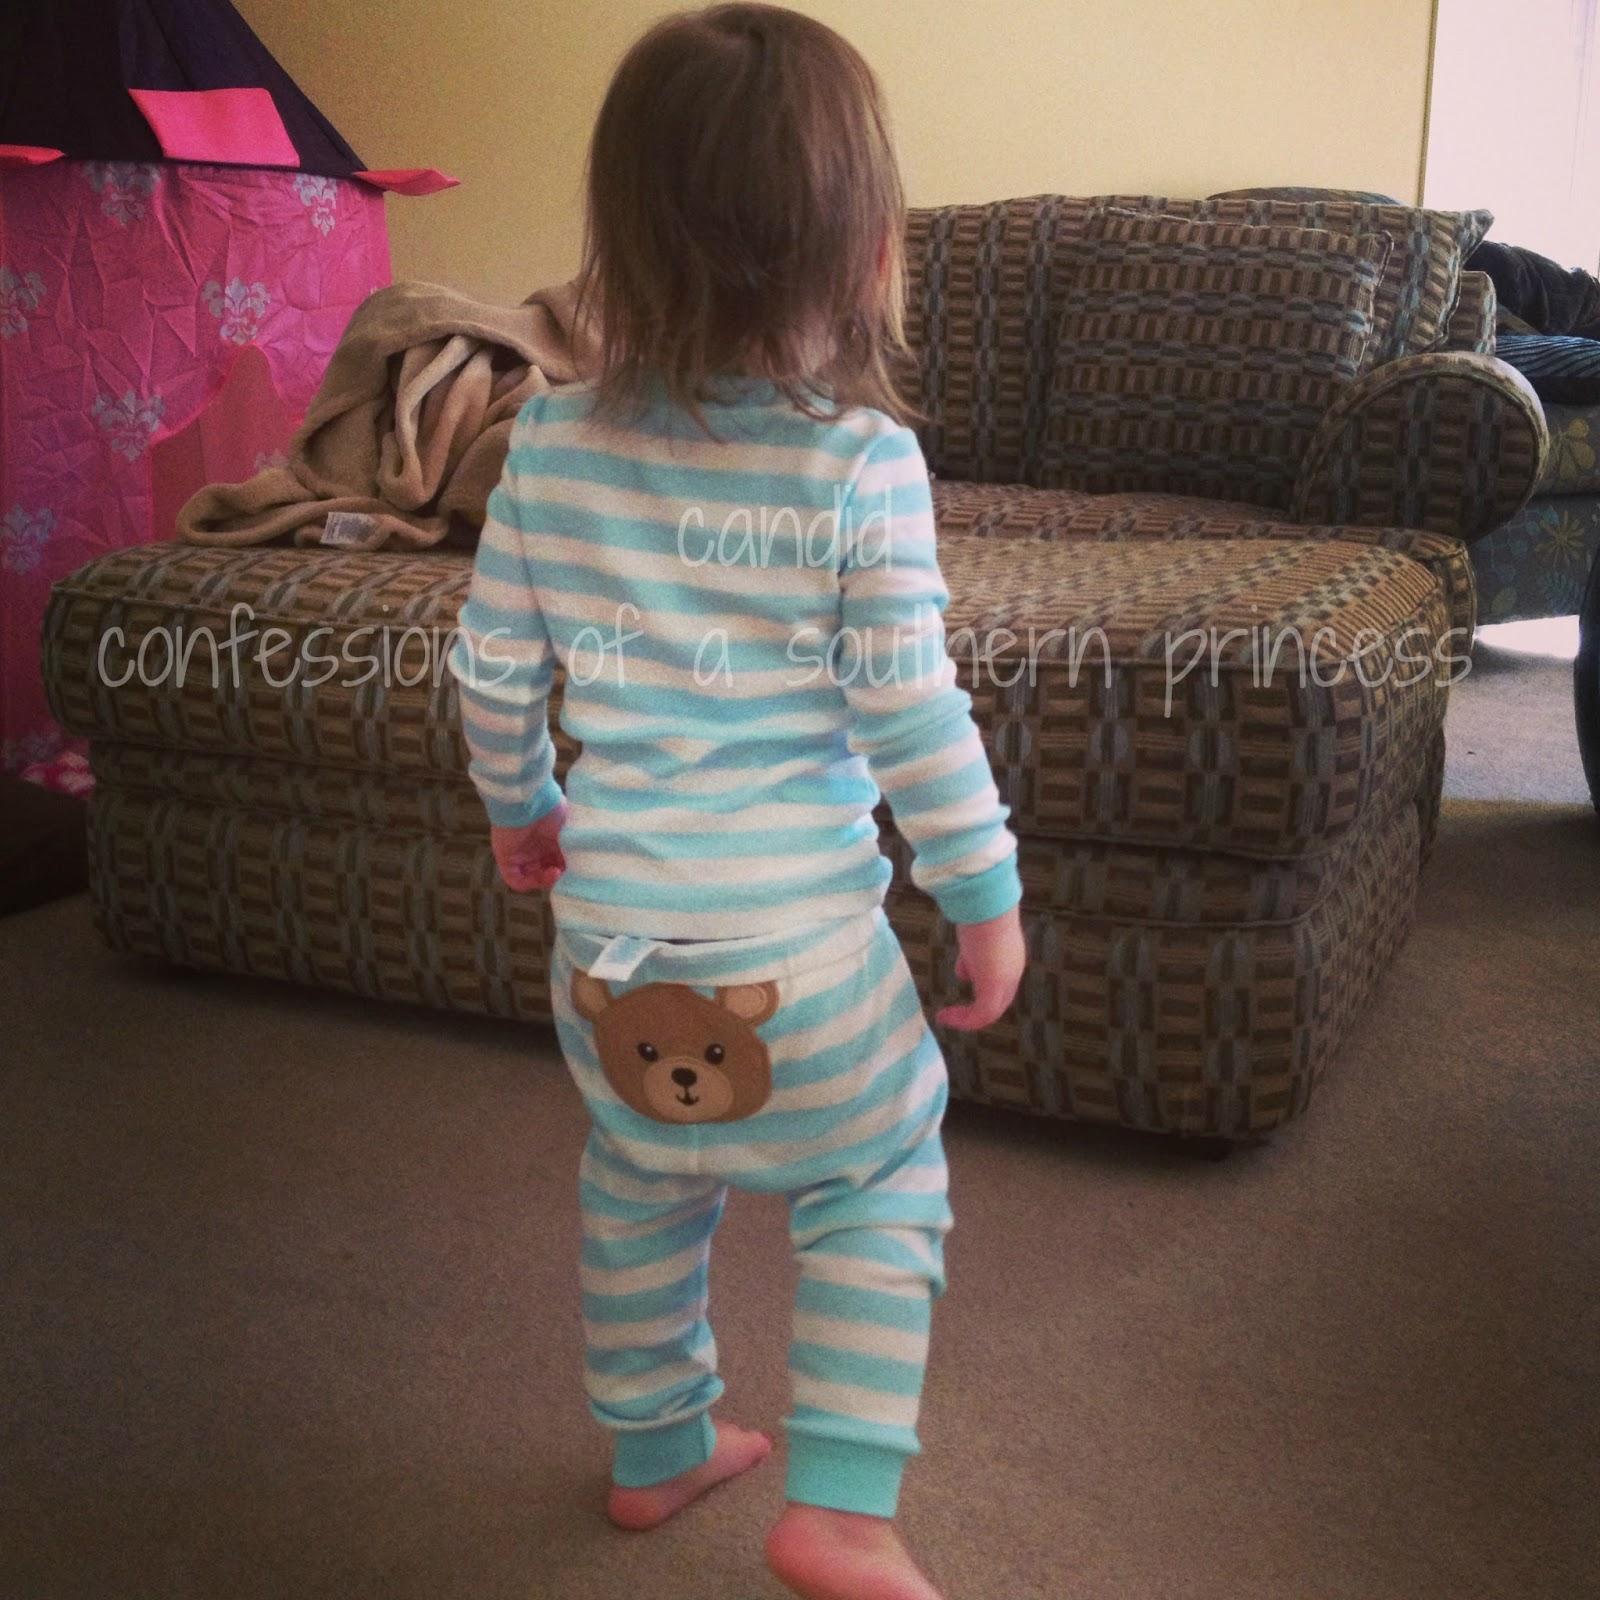 older kids full diaper images - usseek.com